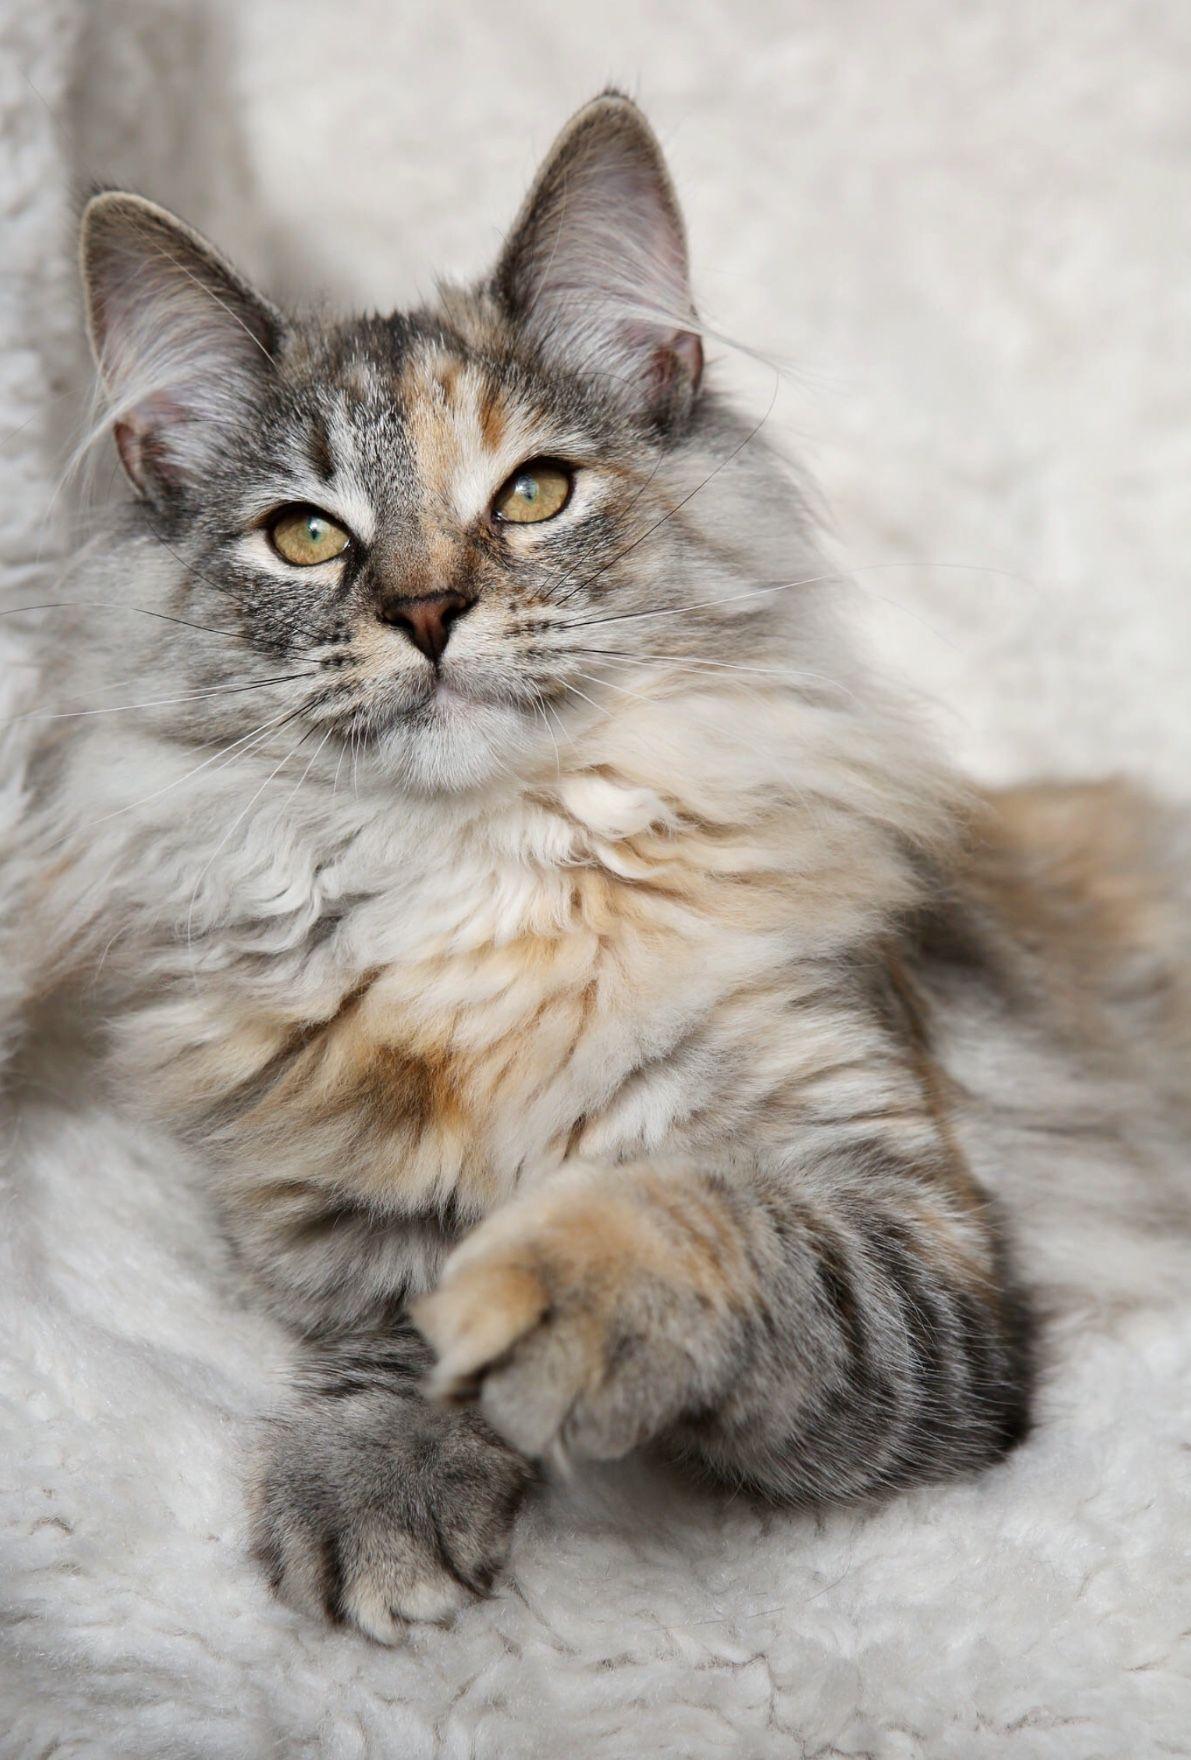 Darling Vom Roten Abendstern 5 Months Old Female Norwegian Forest Kitten A Stunning Black Tortie Silver Tabby Cute Animals